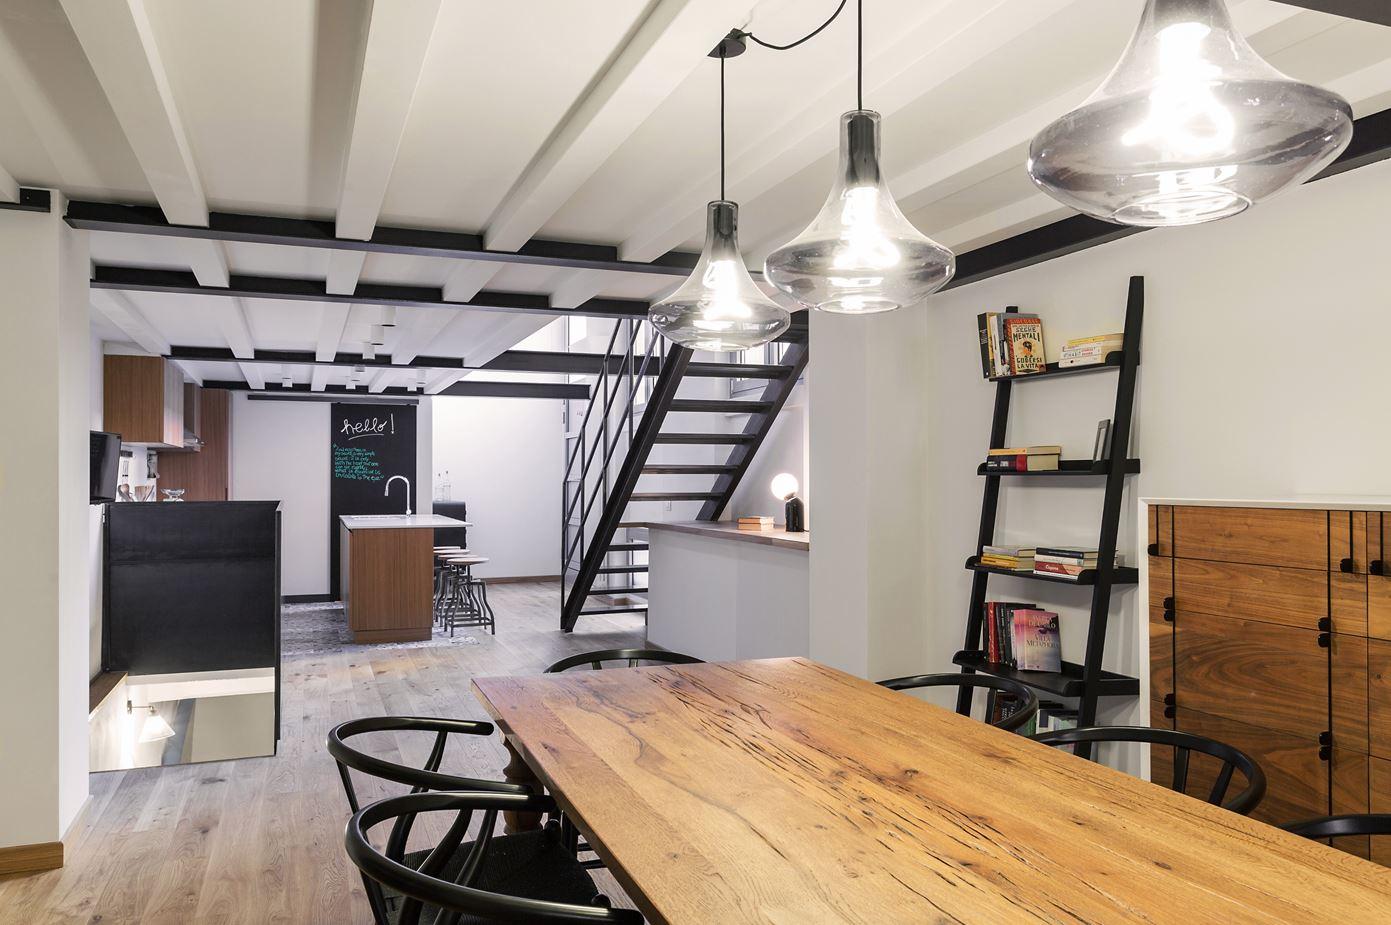 LOFT N in London, UK by Nomade Architettura Interior Design